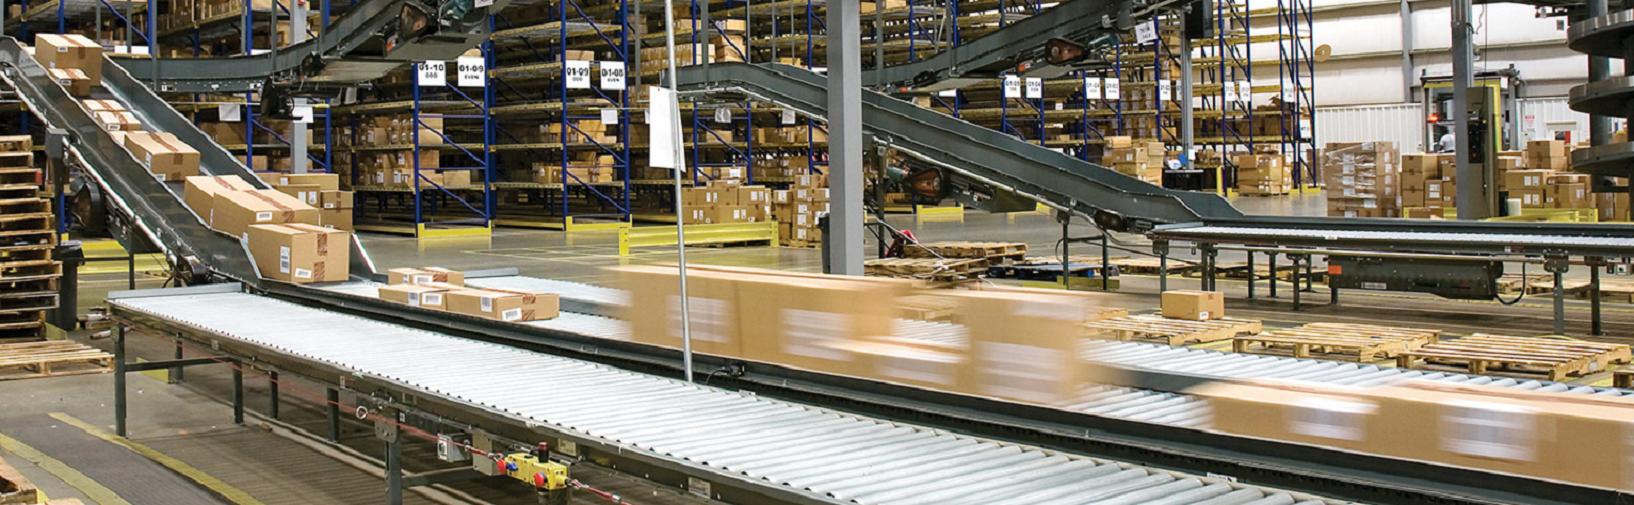 A Honeywell Intelligrated conveyor belt